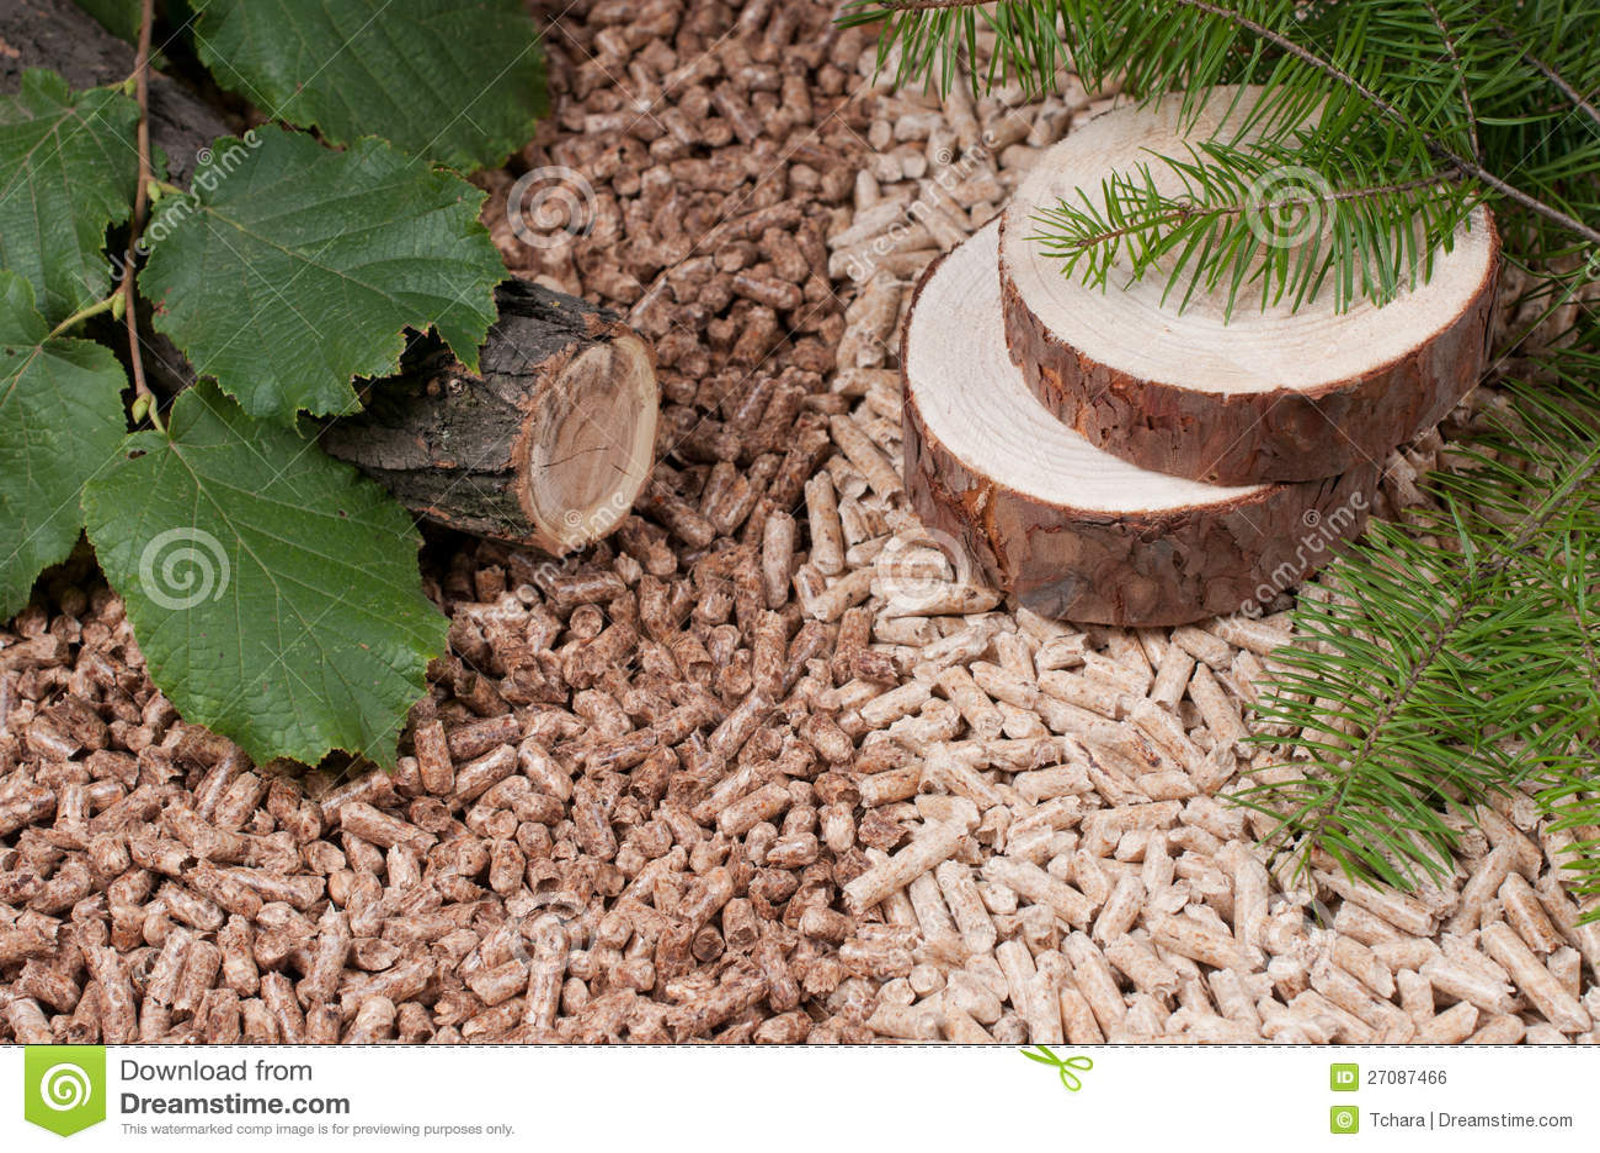 pellets biomass royalty free stock image image 27087466. Black Bedroom Furniture Sets. Home Design Ideas